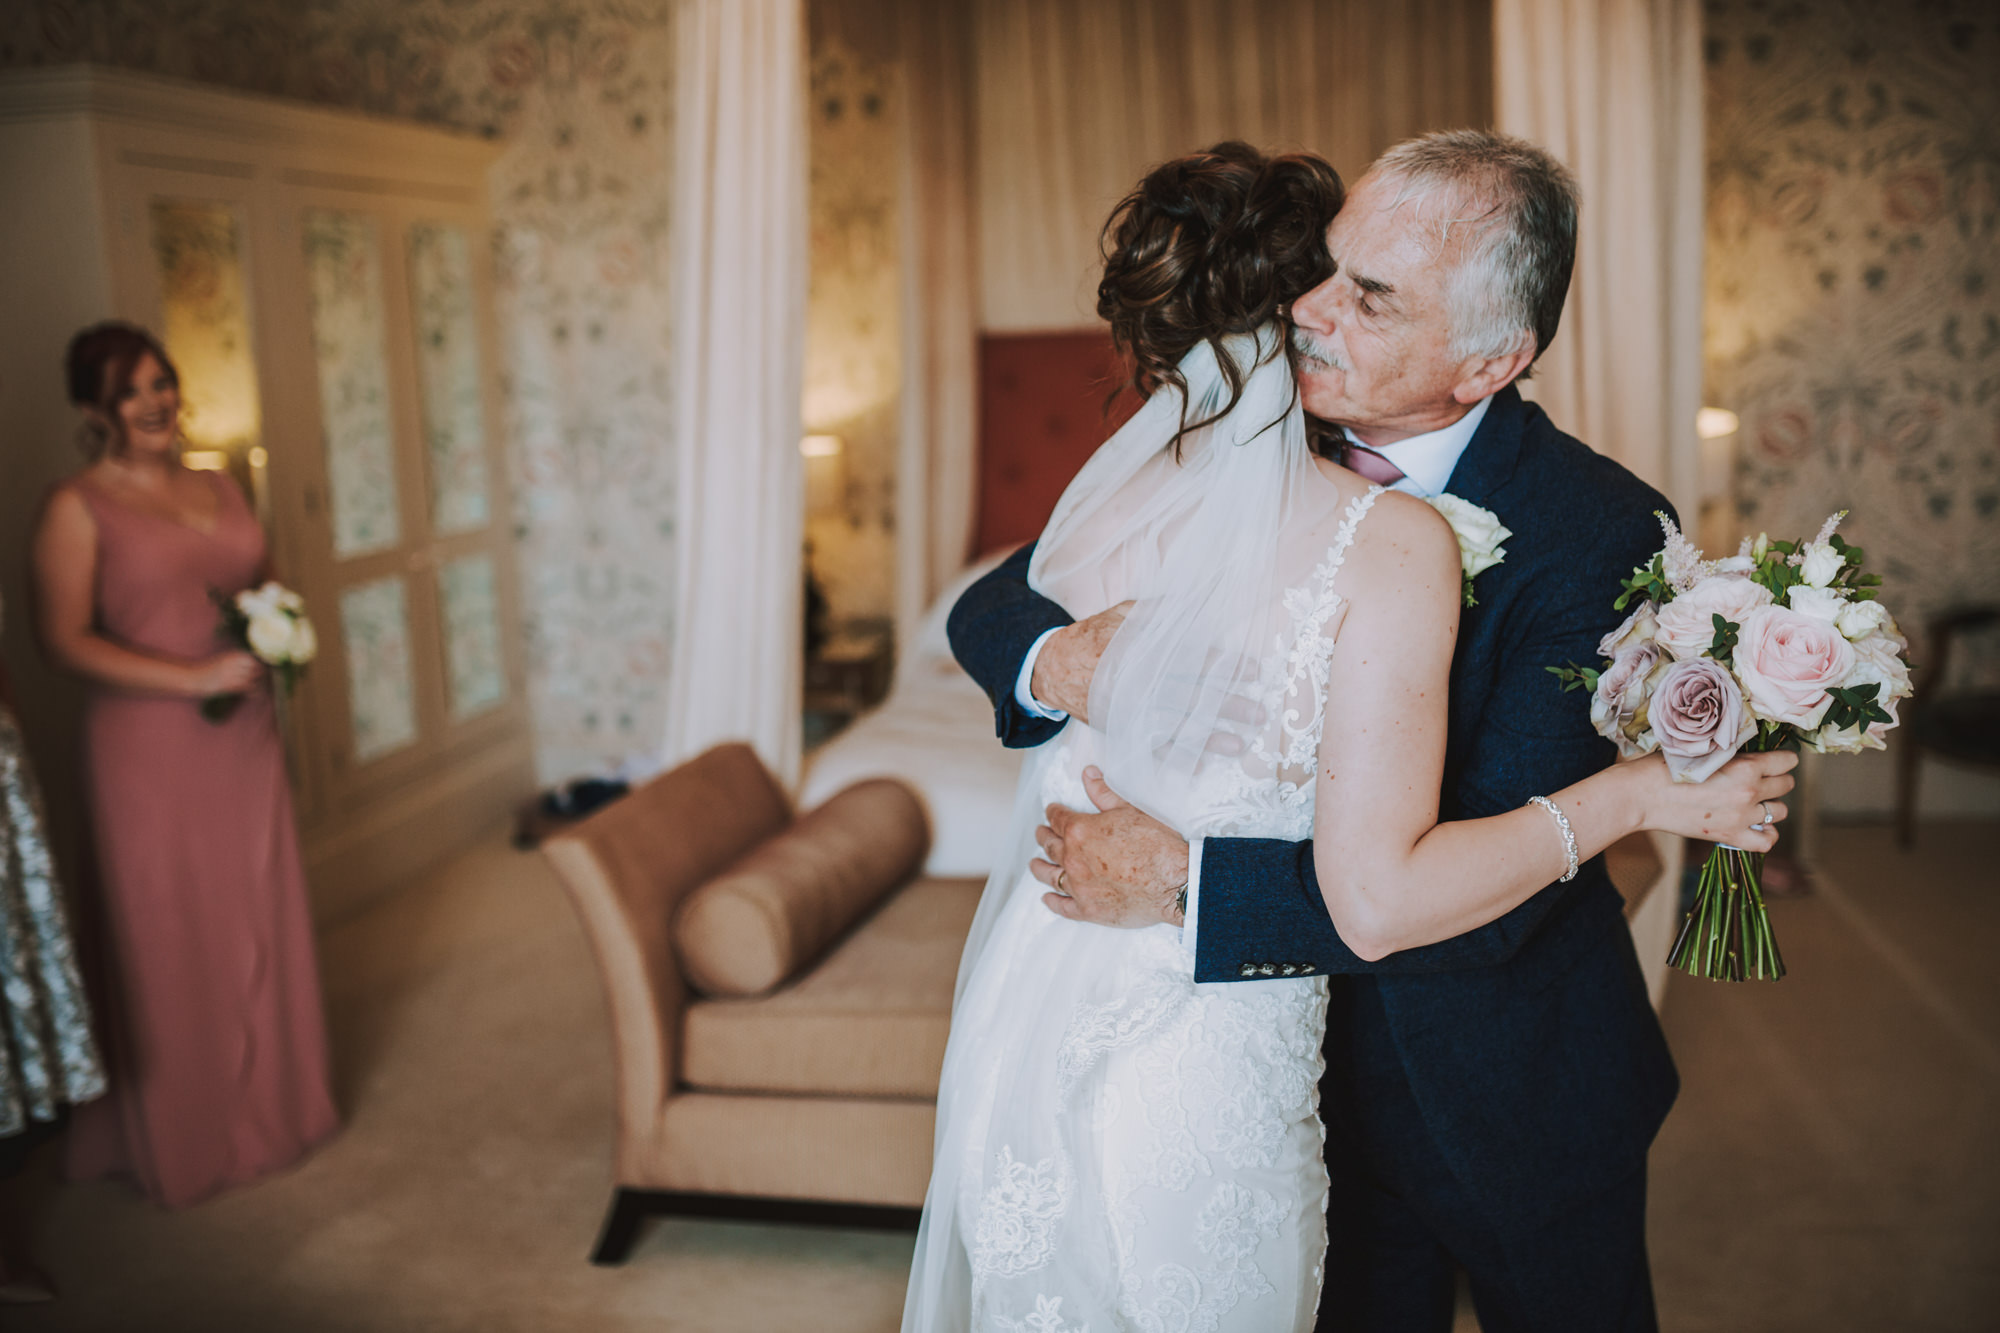 hodsock priory wedding photographers blog35.jpg